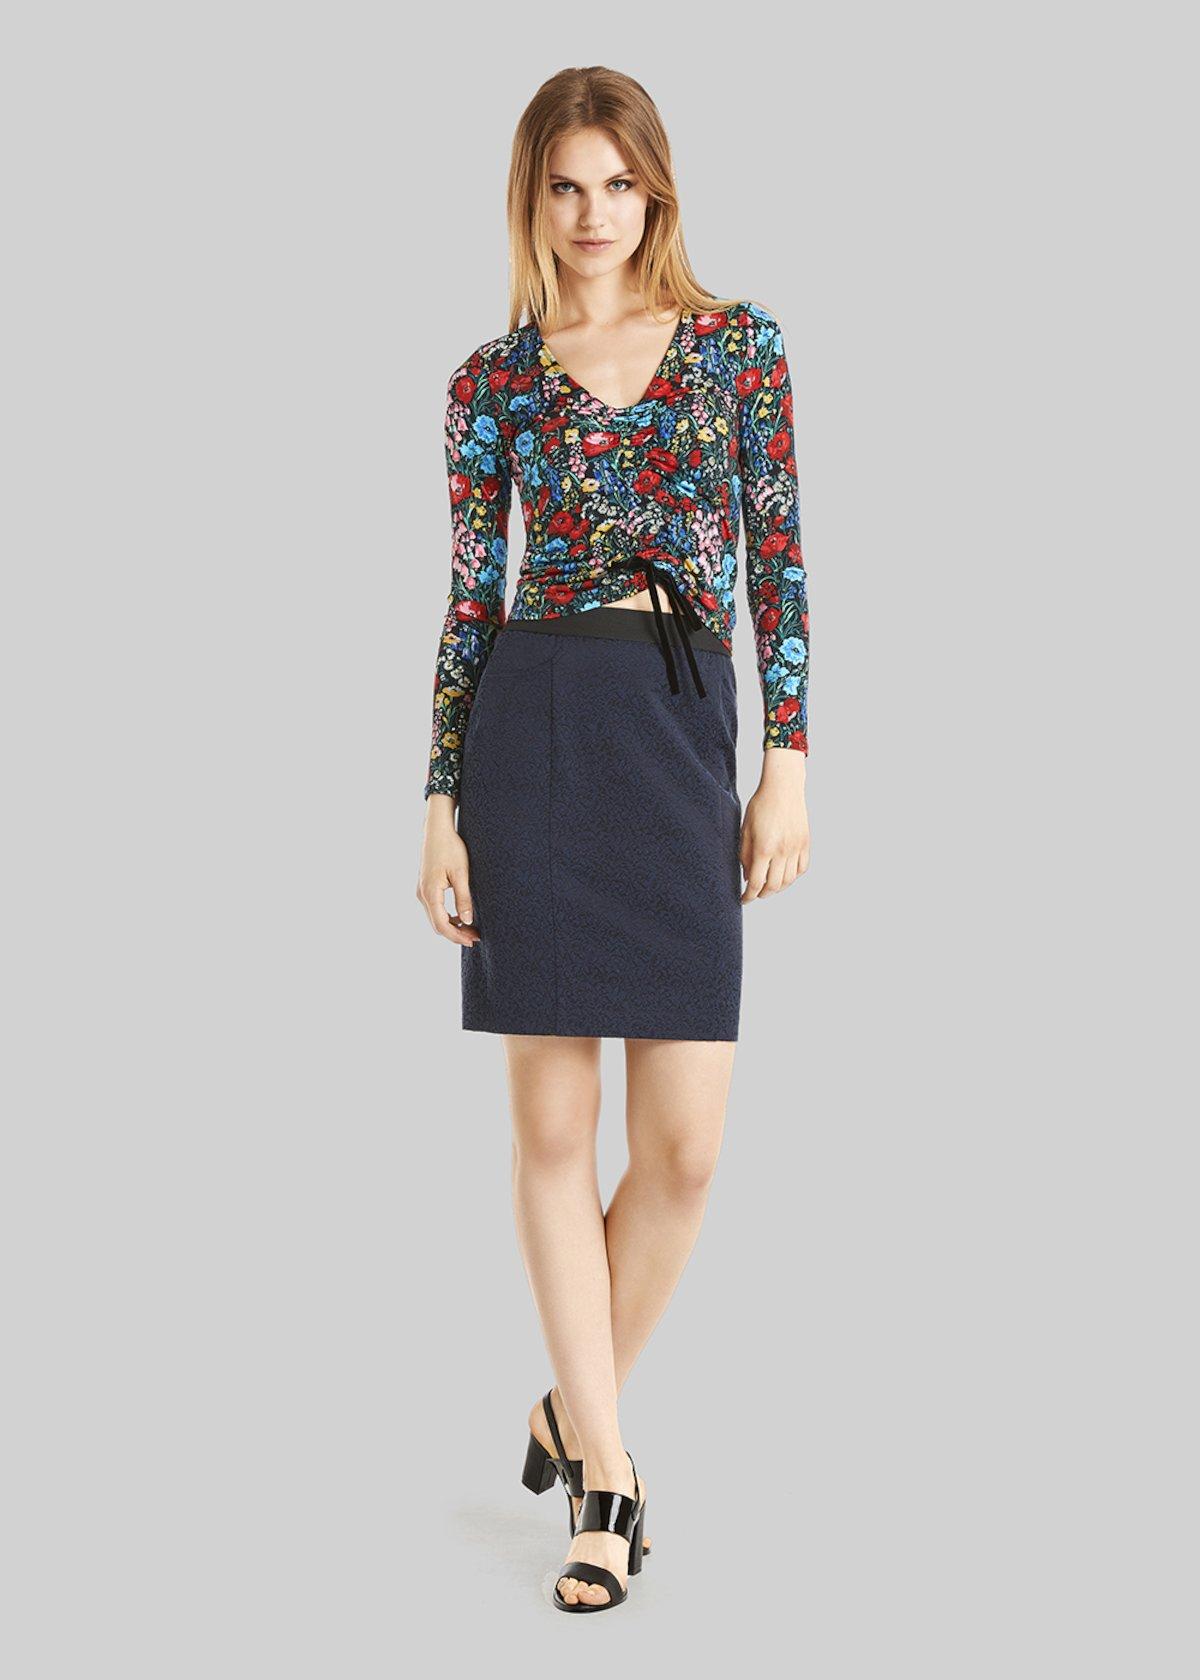 Germana skirt jeggings with shirred elastic